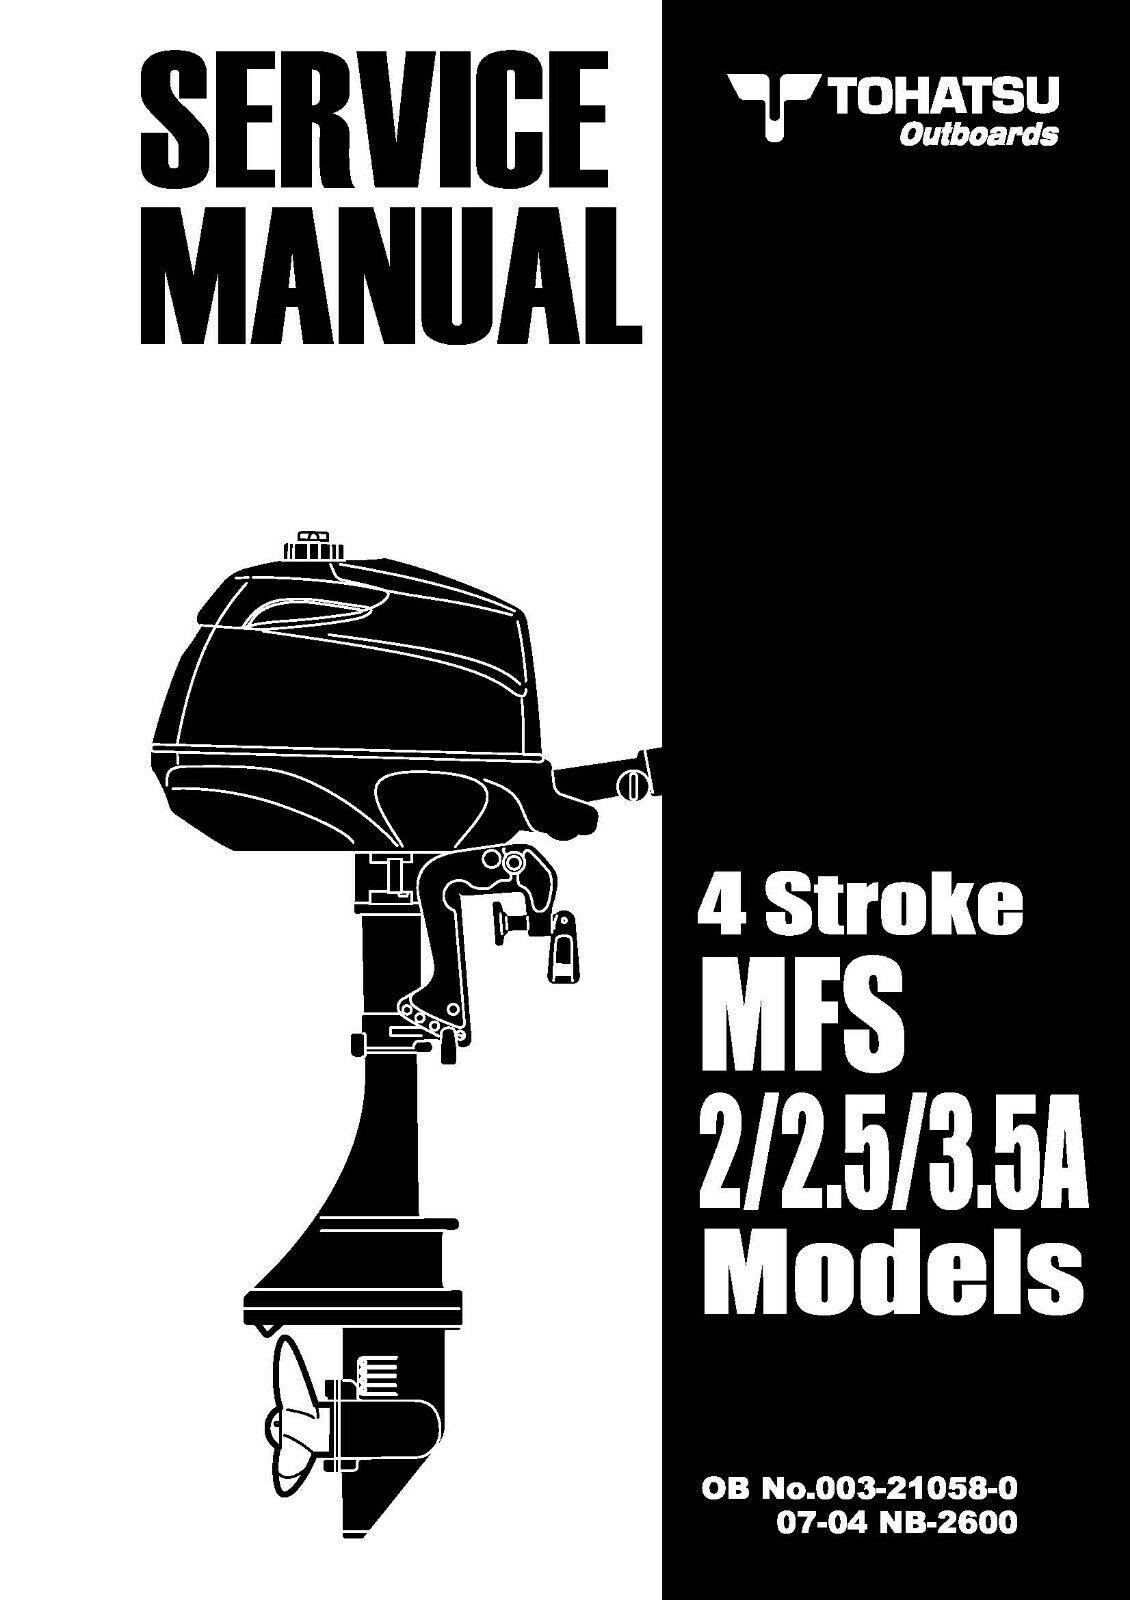 TOHATSU OUTBOARD ENGINE SERVICE KIT M140A A2 140HP 2.STROKE